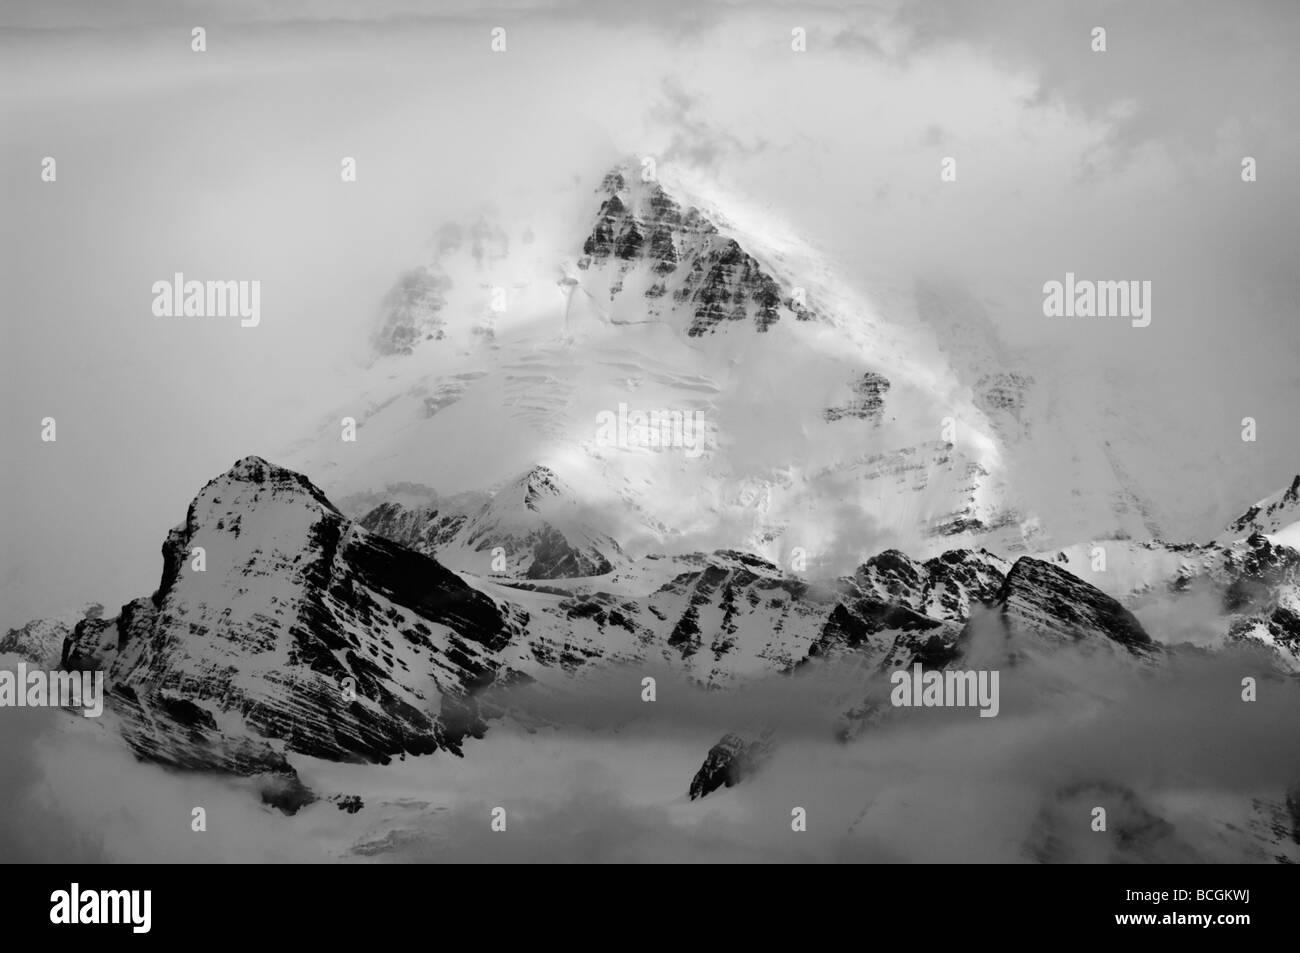 Antarctica, South Georgia Island, Allardyce Range, Misty Mountains, Black and white - Stock Image